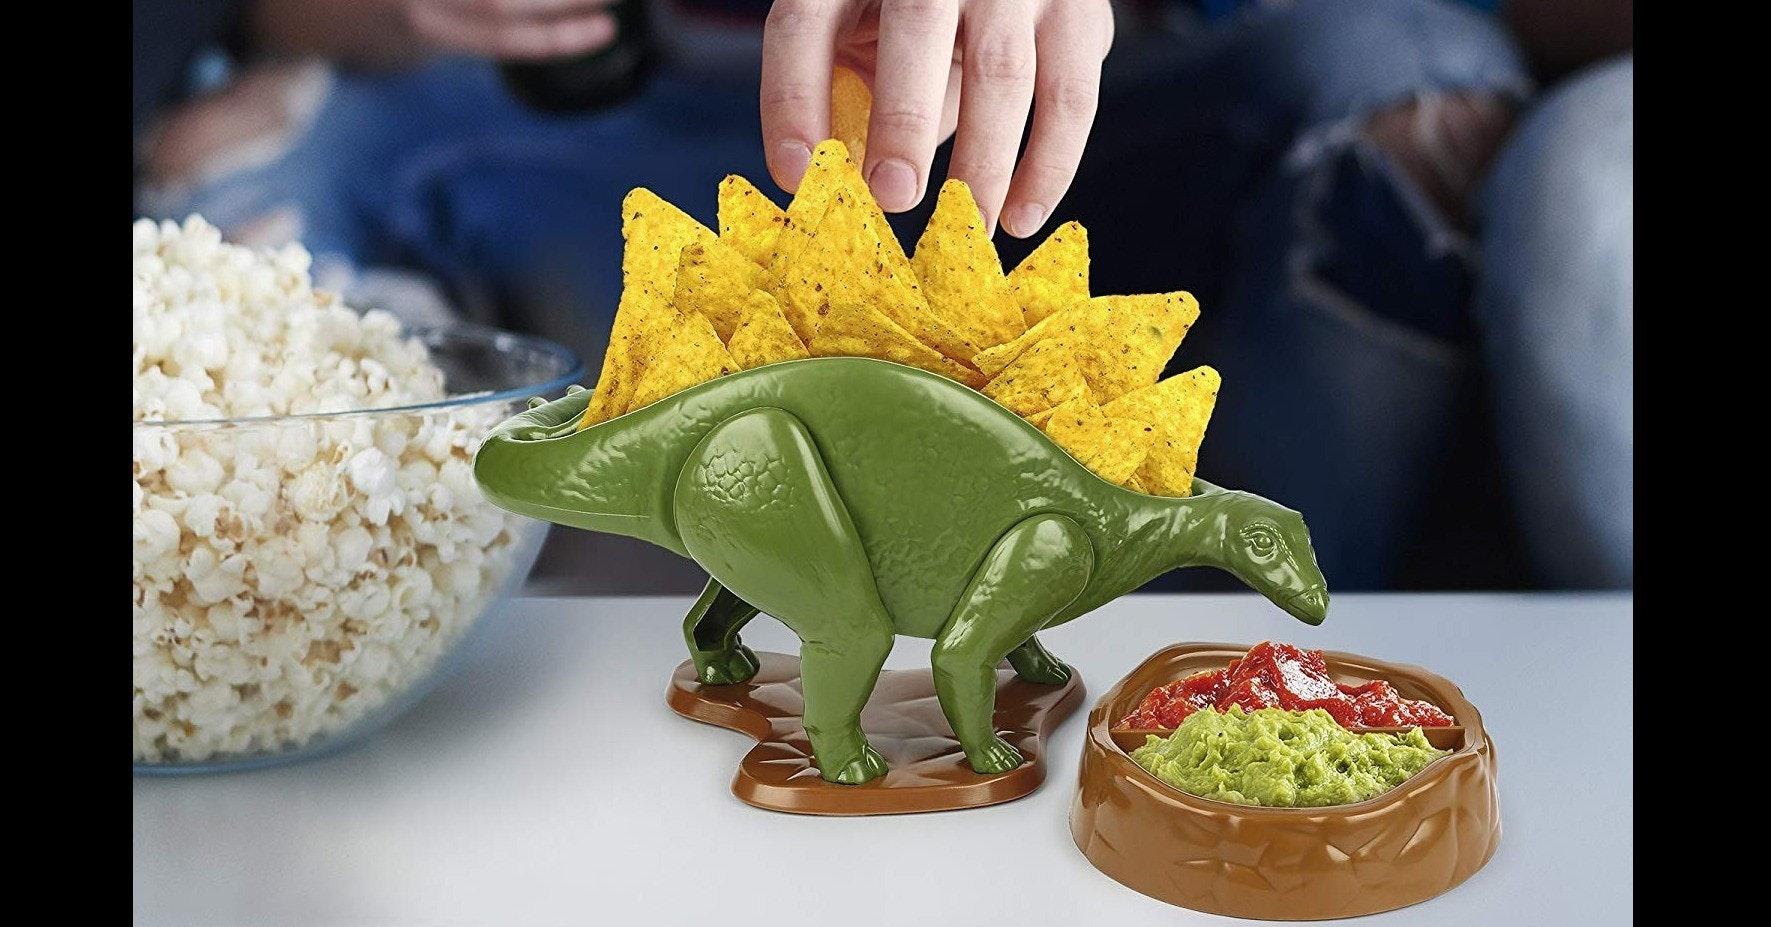 Nachos, Taco, Guacamole, Salsa, Chips and dip, Bowl, Pretzel, Snack, Dipping sauce, Dish, nachosaurus, food, flowerpot